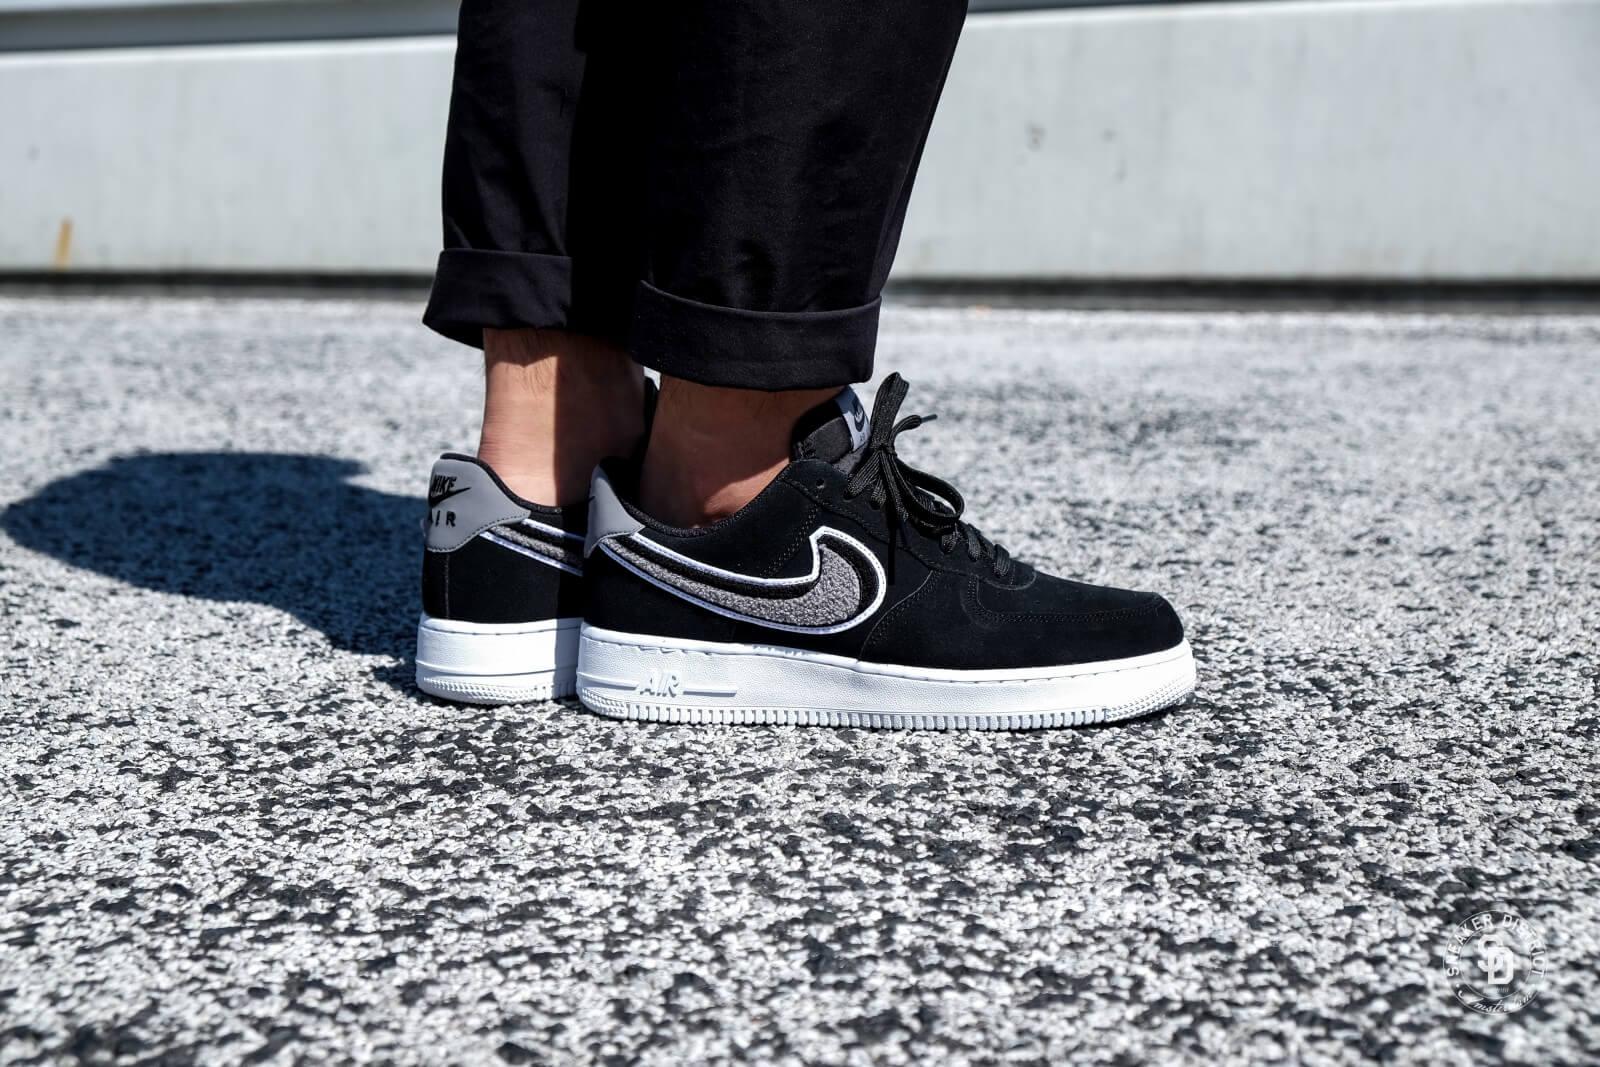 Nike Air Force 1 Low 07 LV8 Black Cool Grey White 823511 014